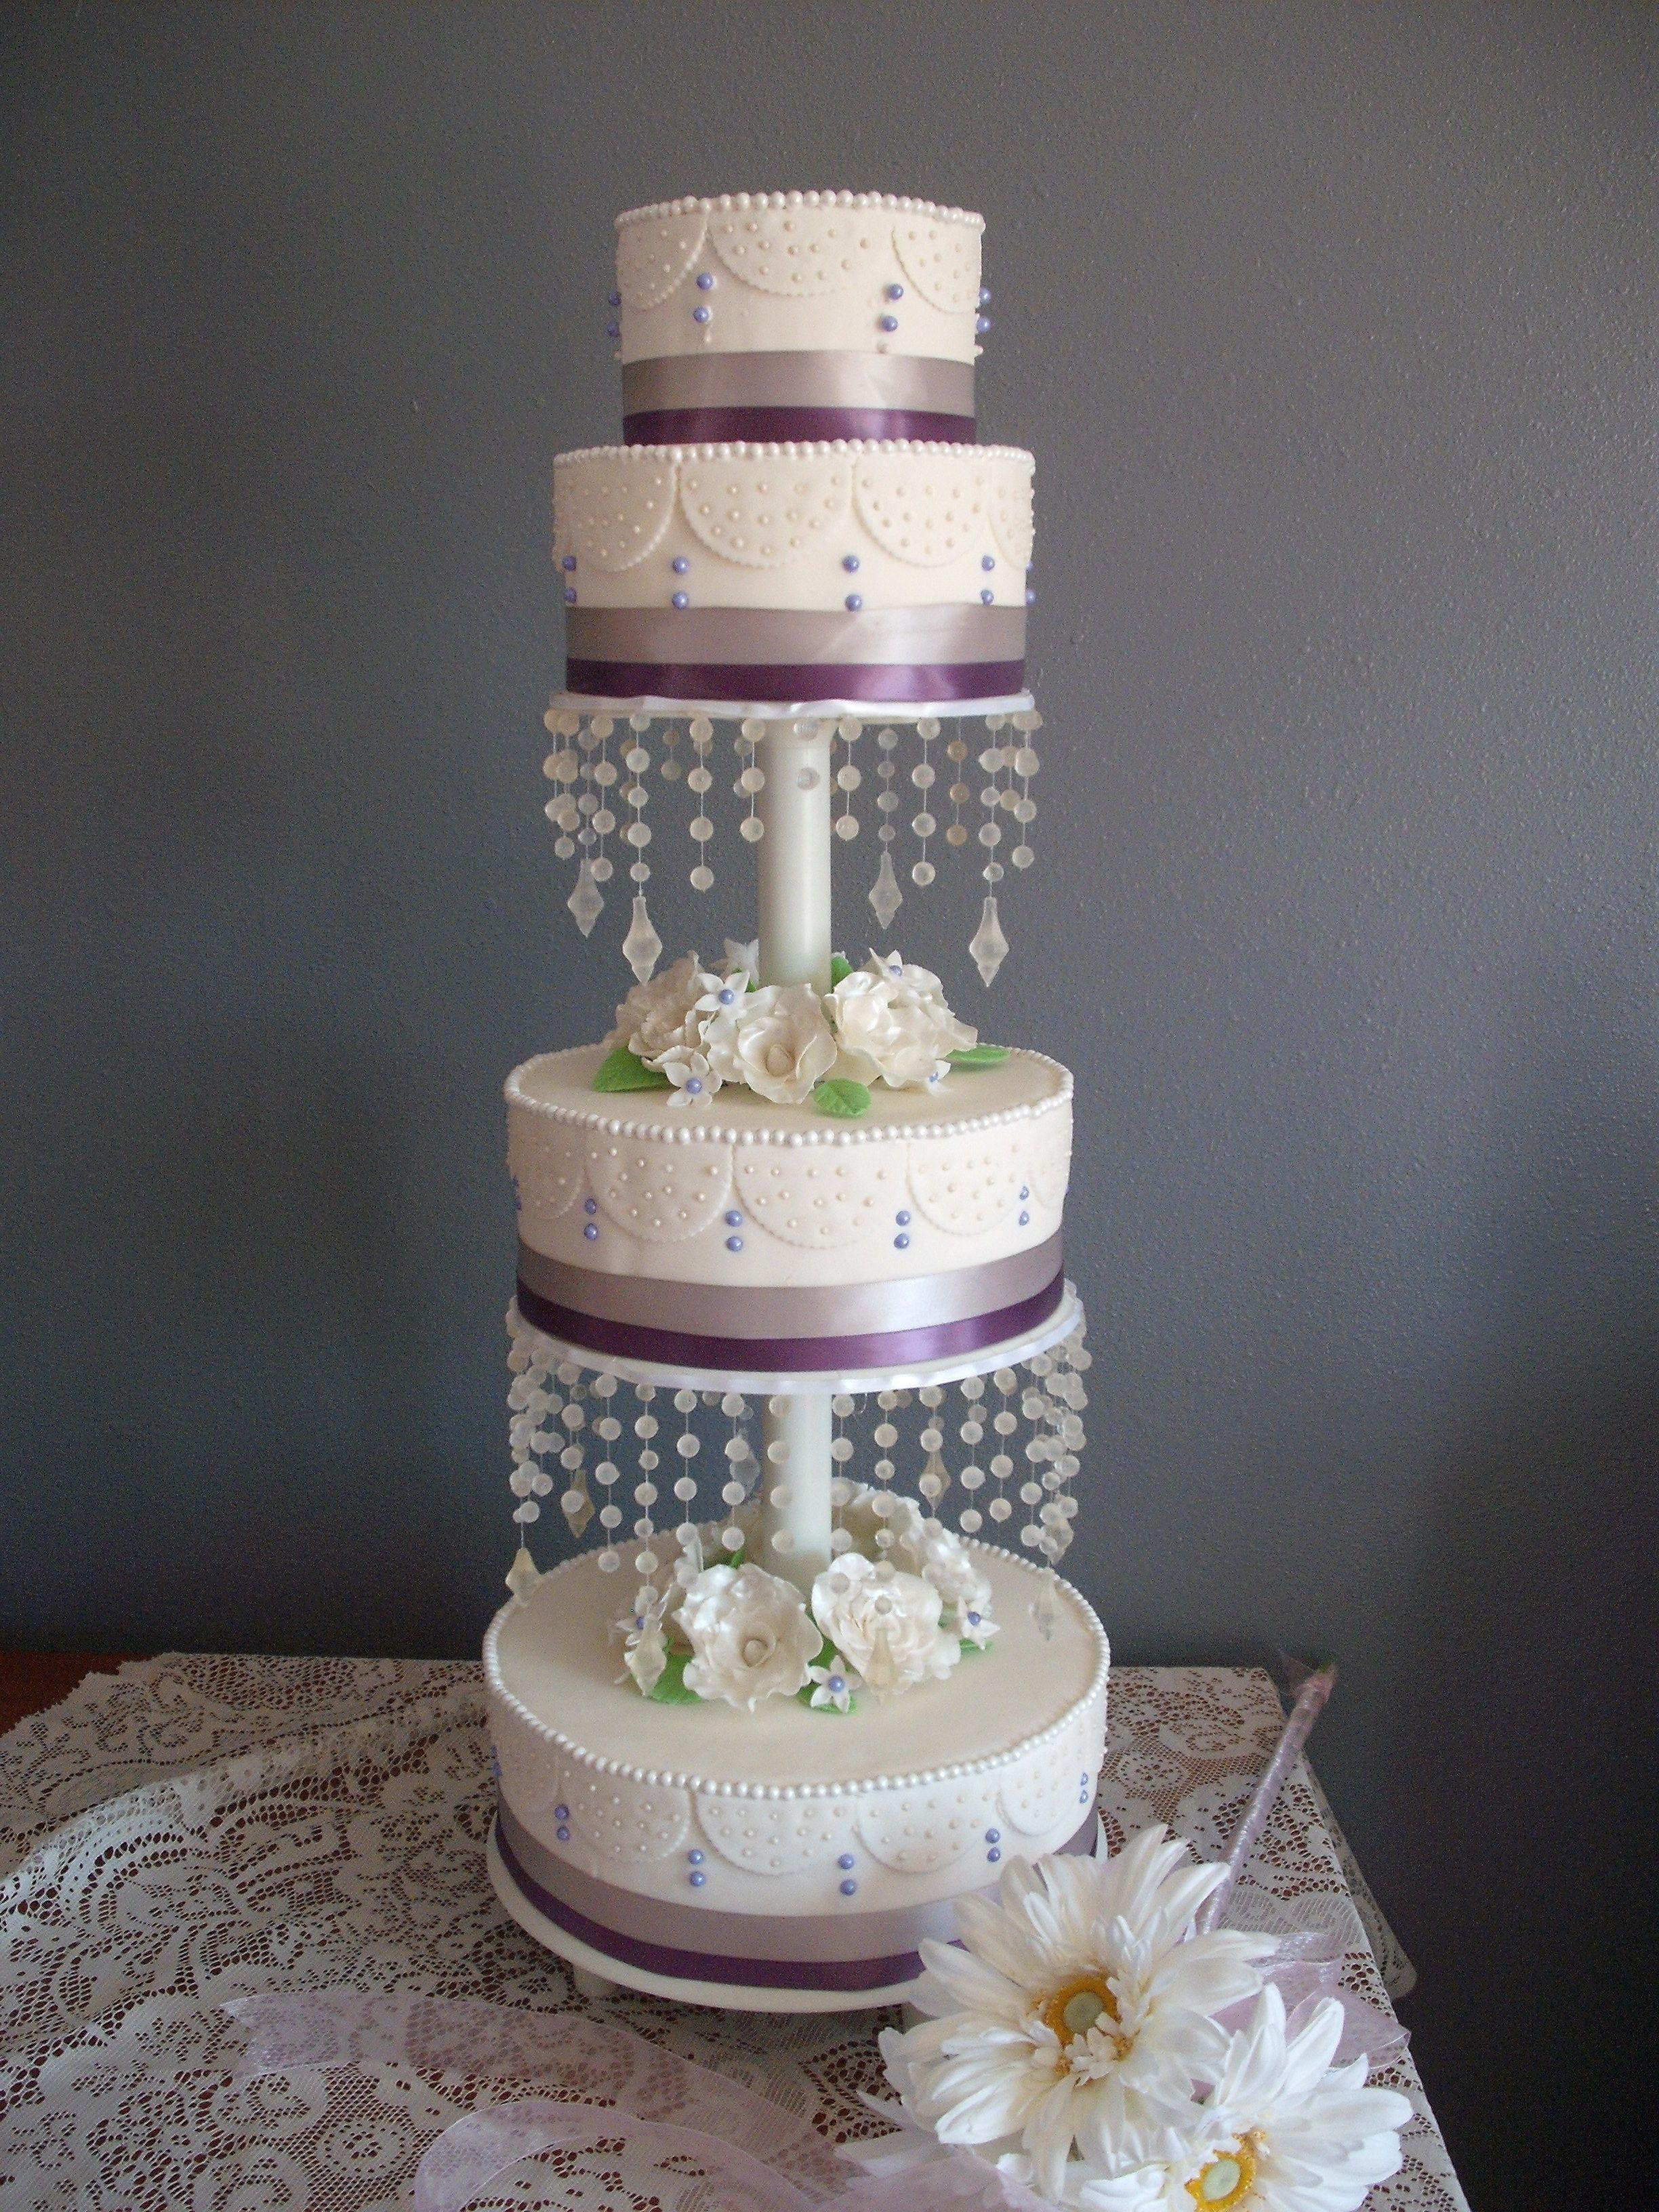 wedding cake w edible sugar beads carseycakes pinterest salt lake city ut cake wedding. Black Bedroom Furniture Sets. Home Design Ideas